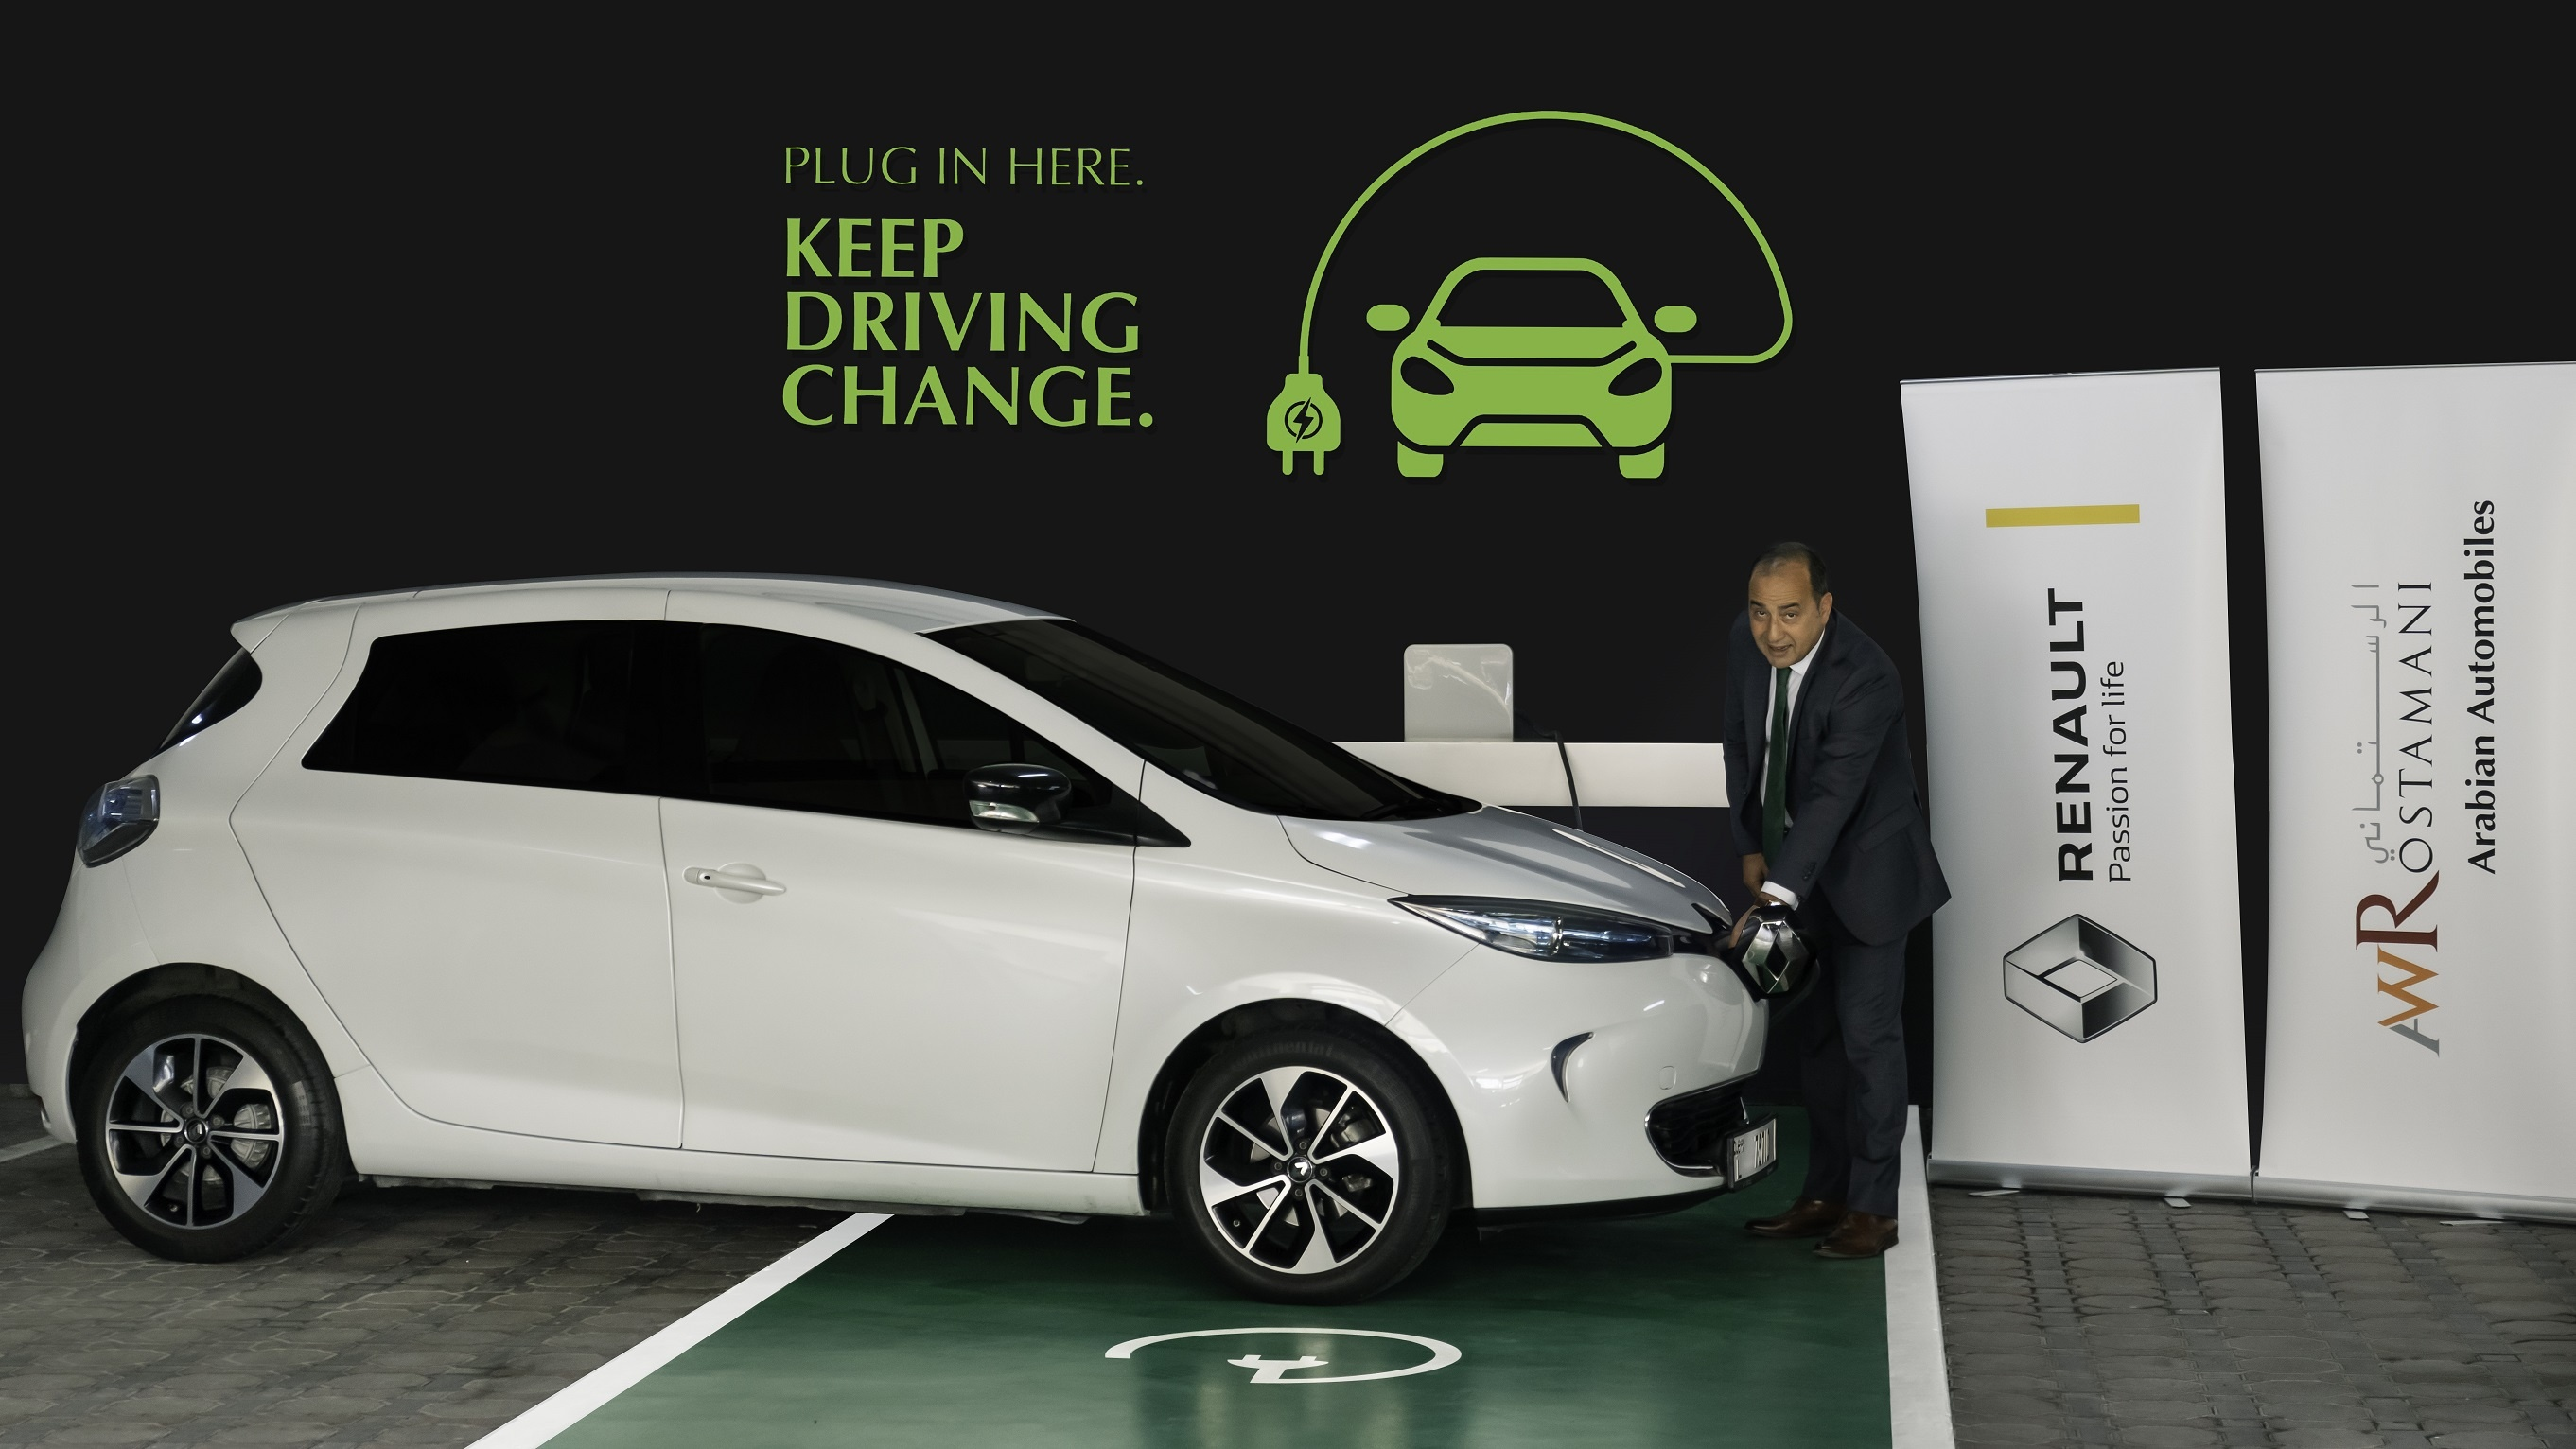 Arabian Automobiles Installs EV Charging Station to Make Dubai Greener